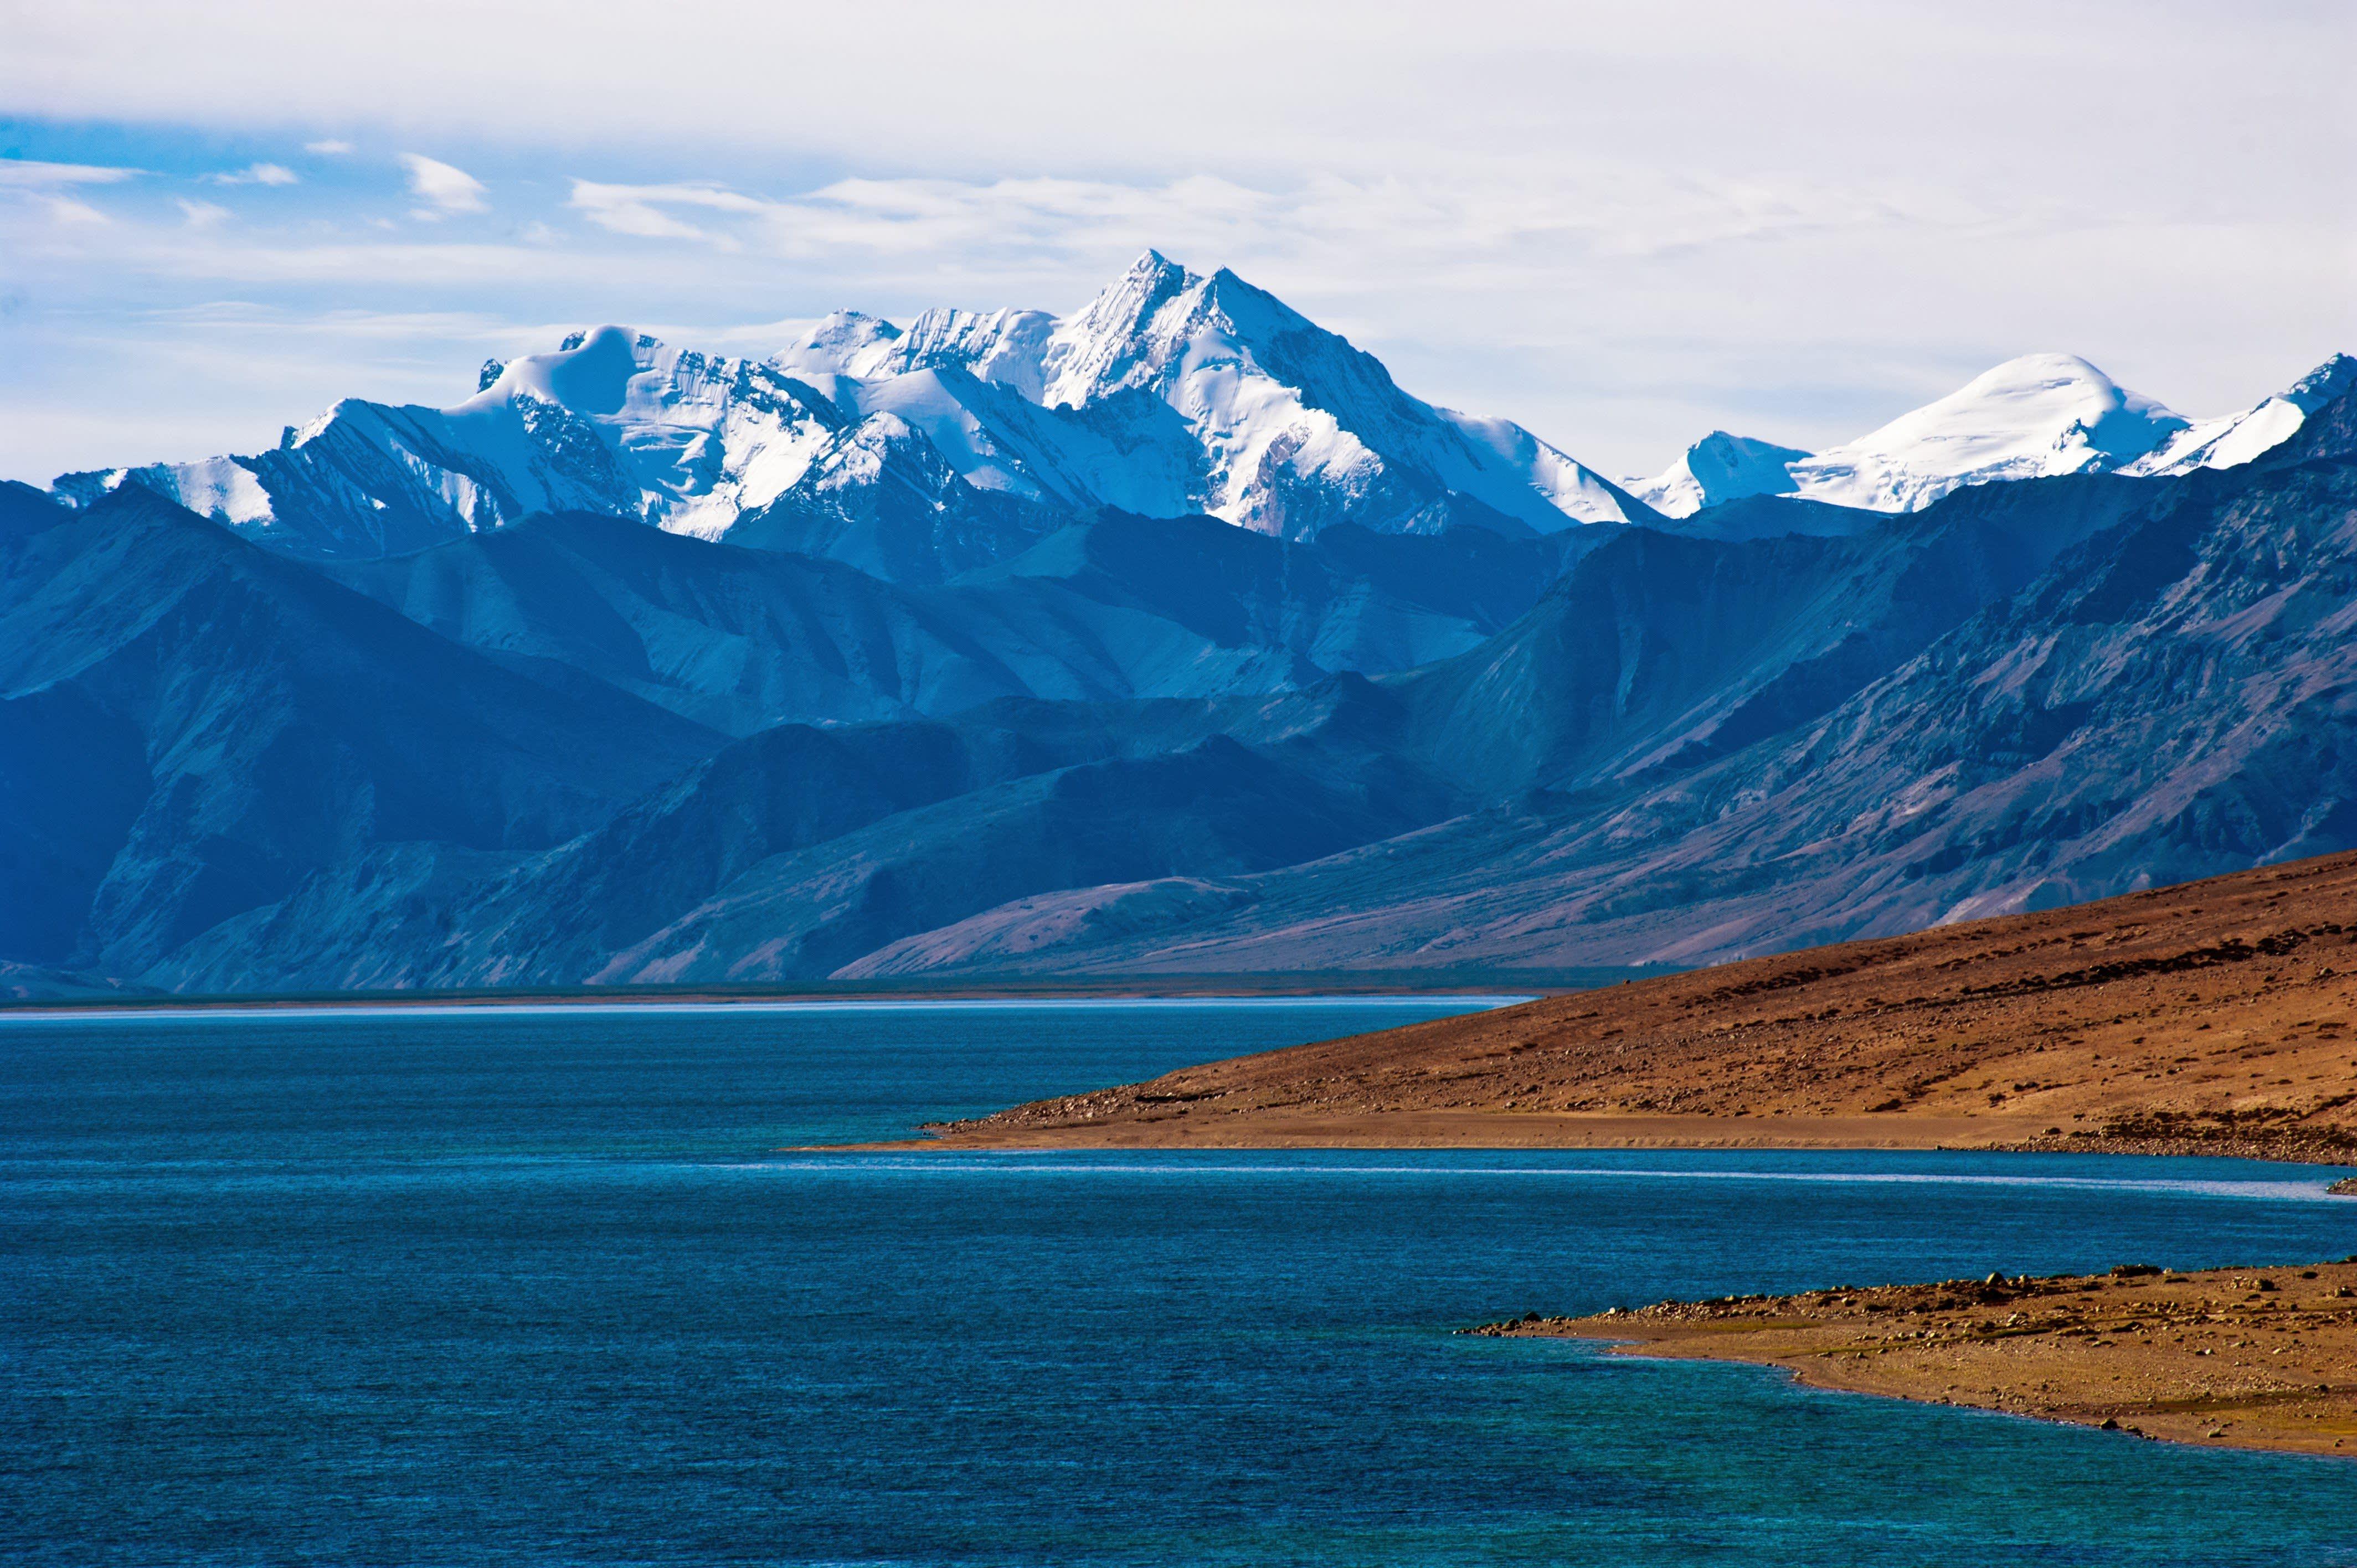 Eindrucksvolles Panorama der Himalaya Berge